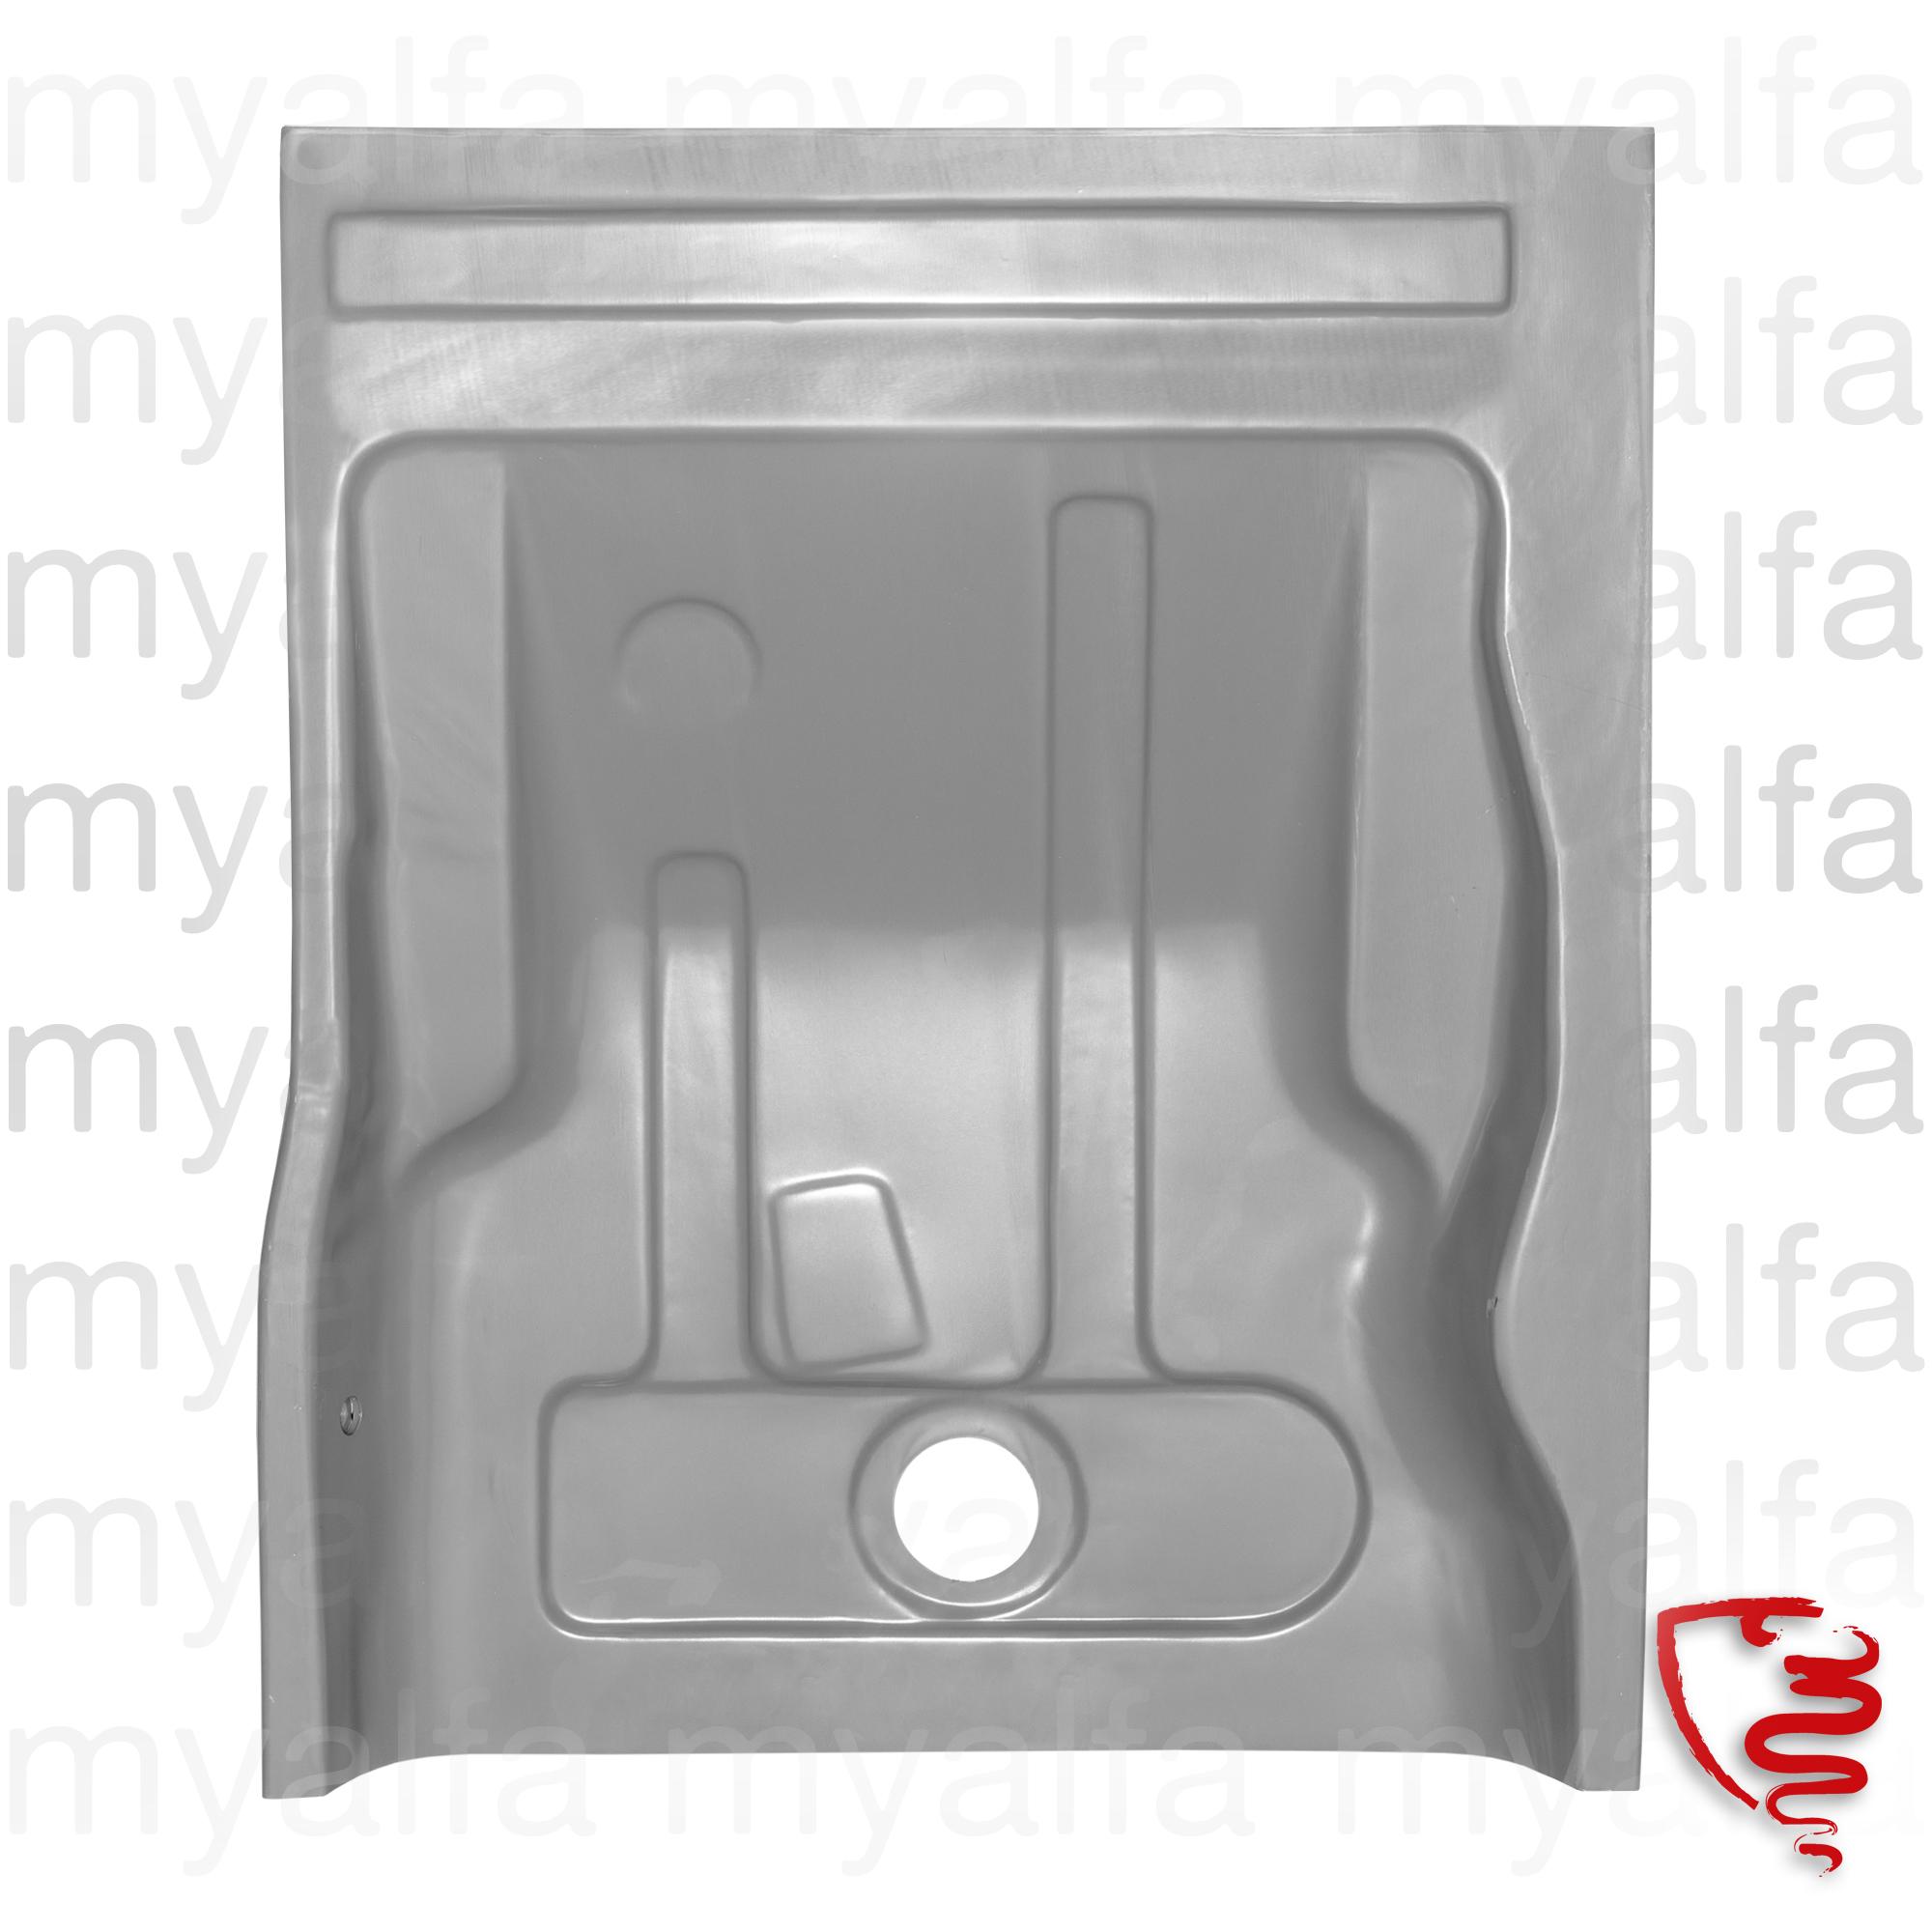 Panel Floor GT Bertone Back Dtº for 105/115, Coupe, Body parts, Panels, Floor